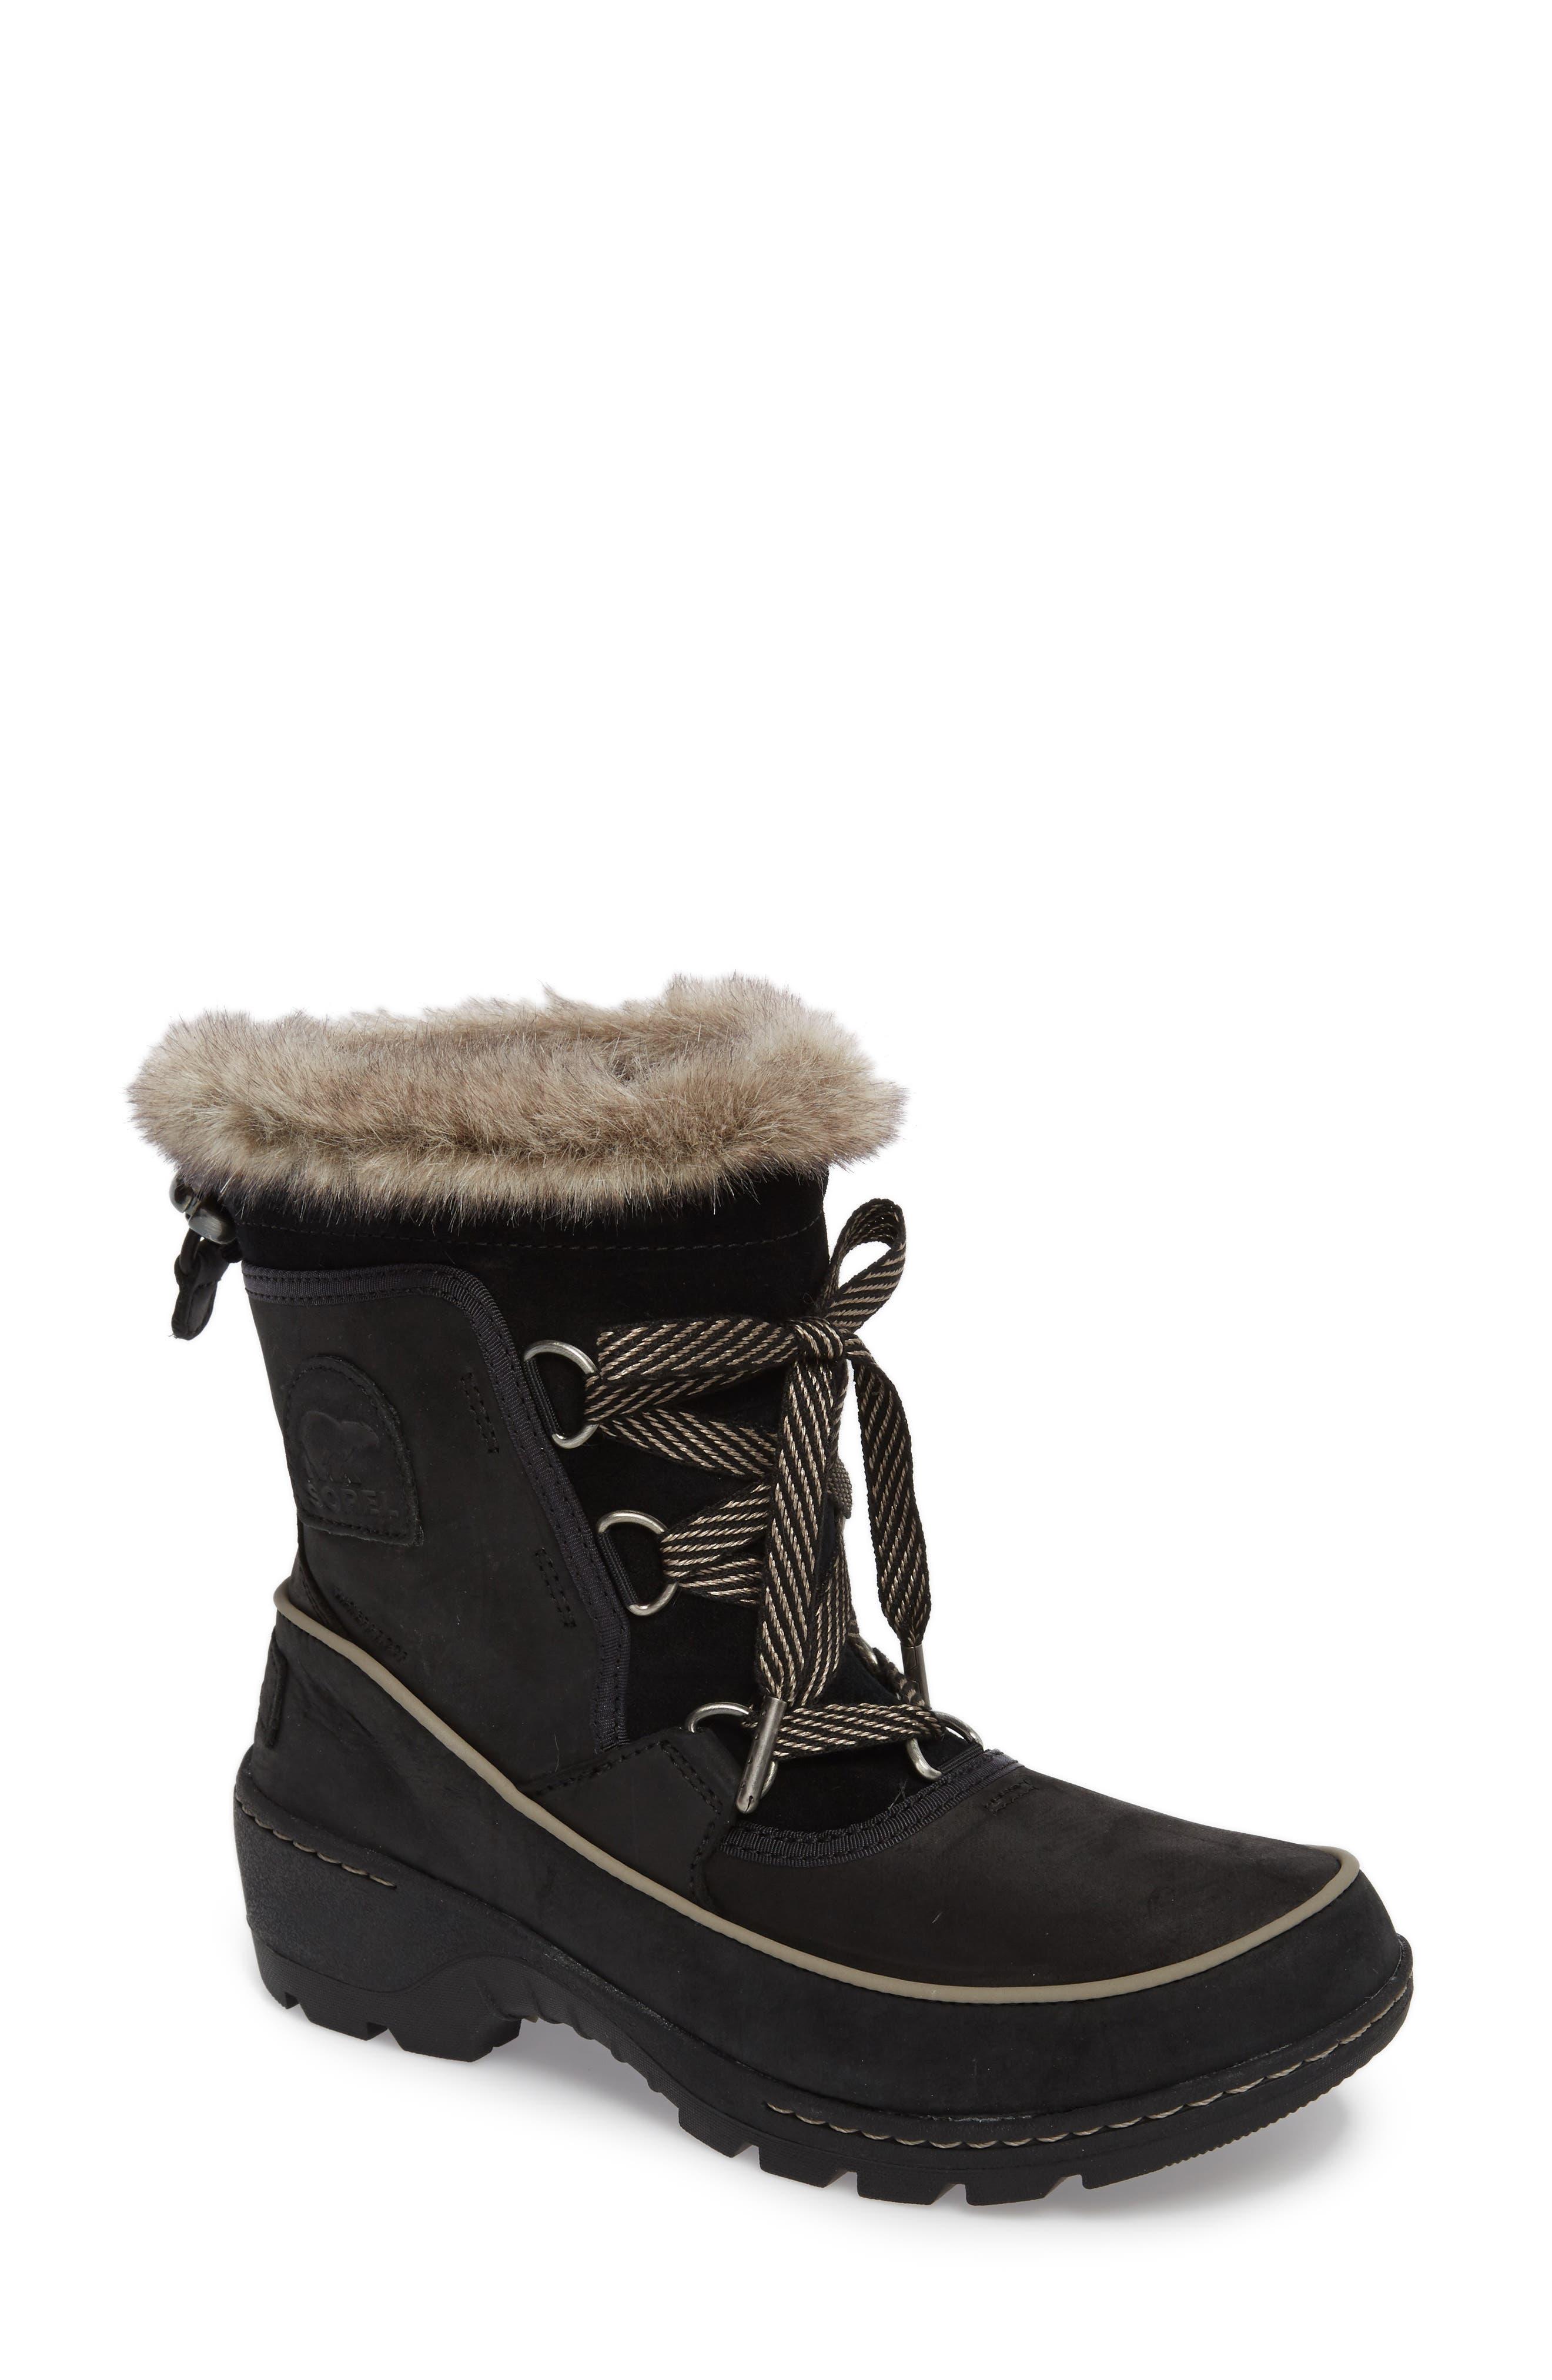 Main Image - SOREL Tivoli II Insulated Winter Boot with Faux Fur Trim (Women)